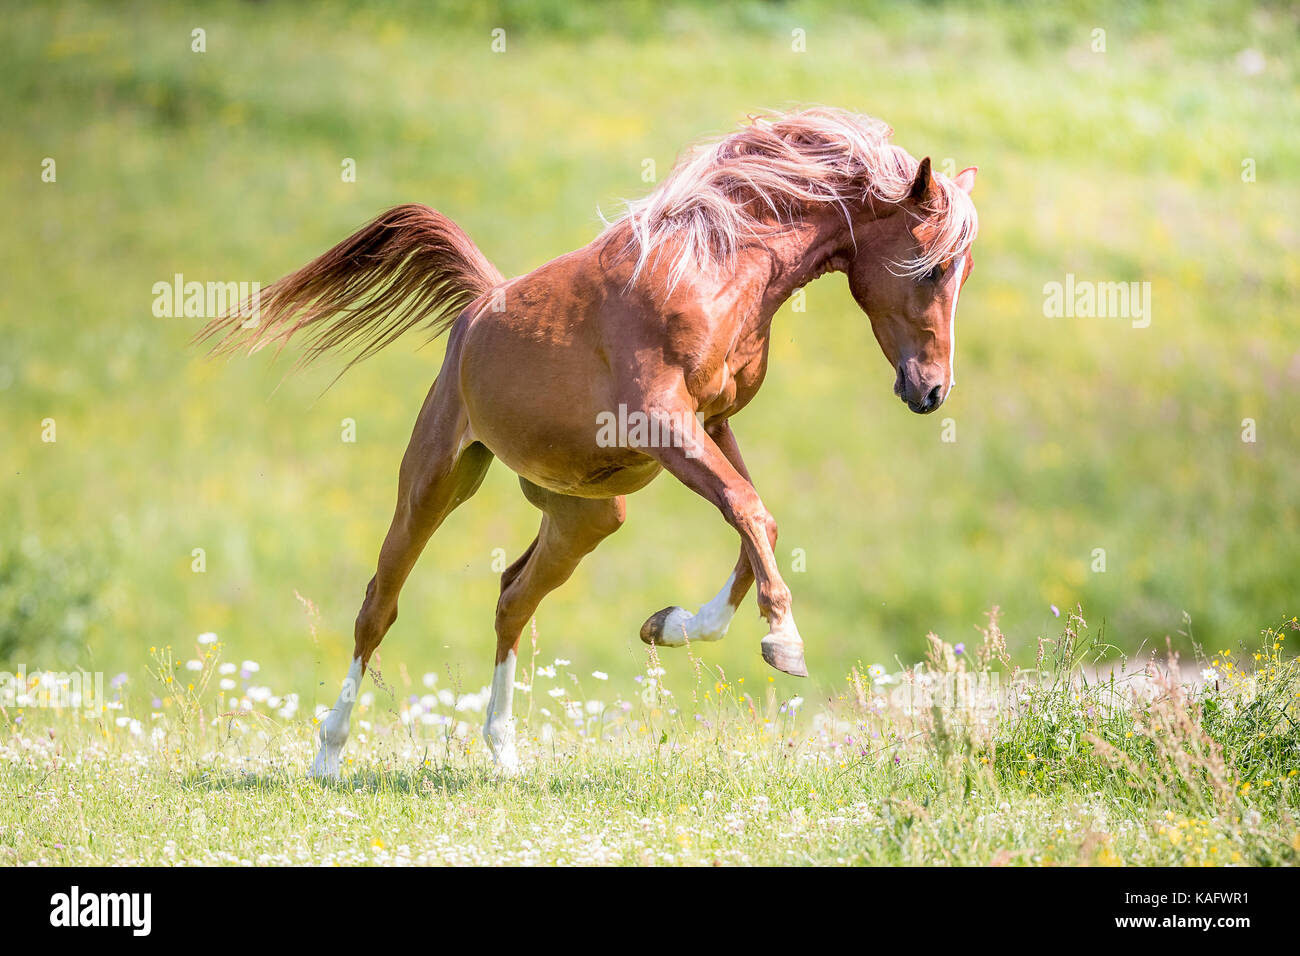 Arabian Horse. Juvenile chestnut stallion leaping on a pasture. Austria Stock Photo